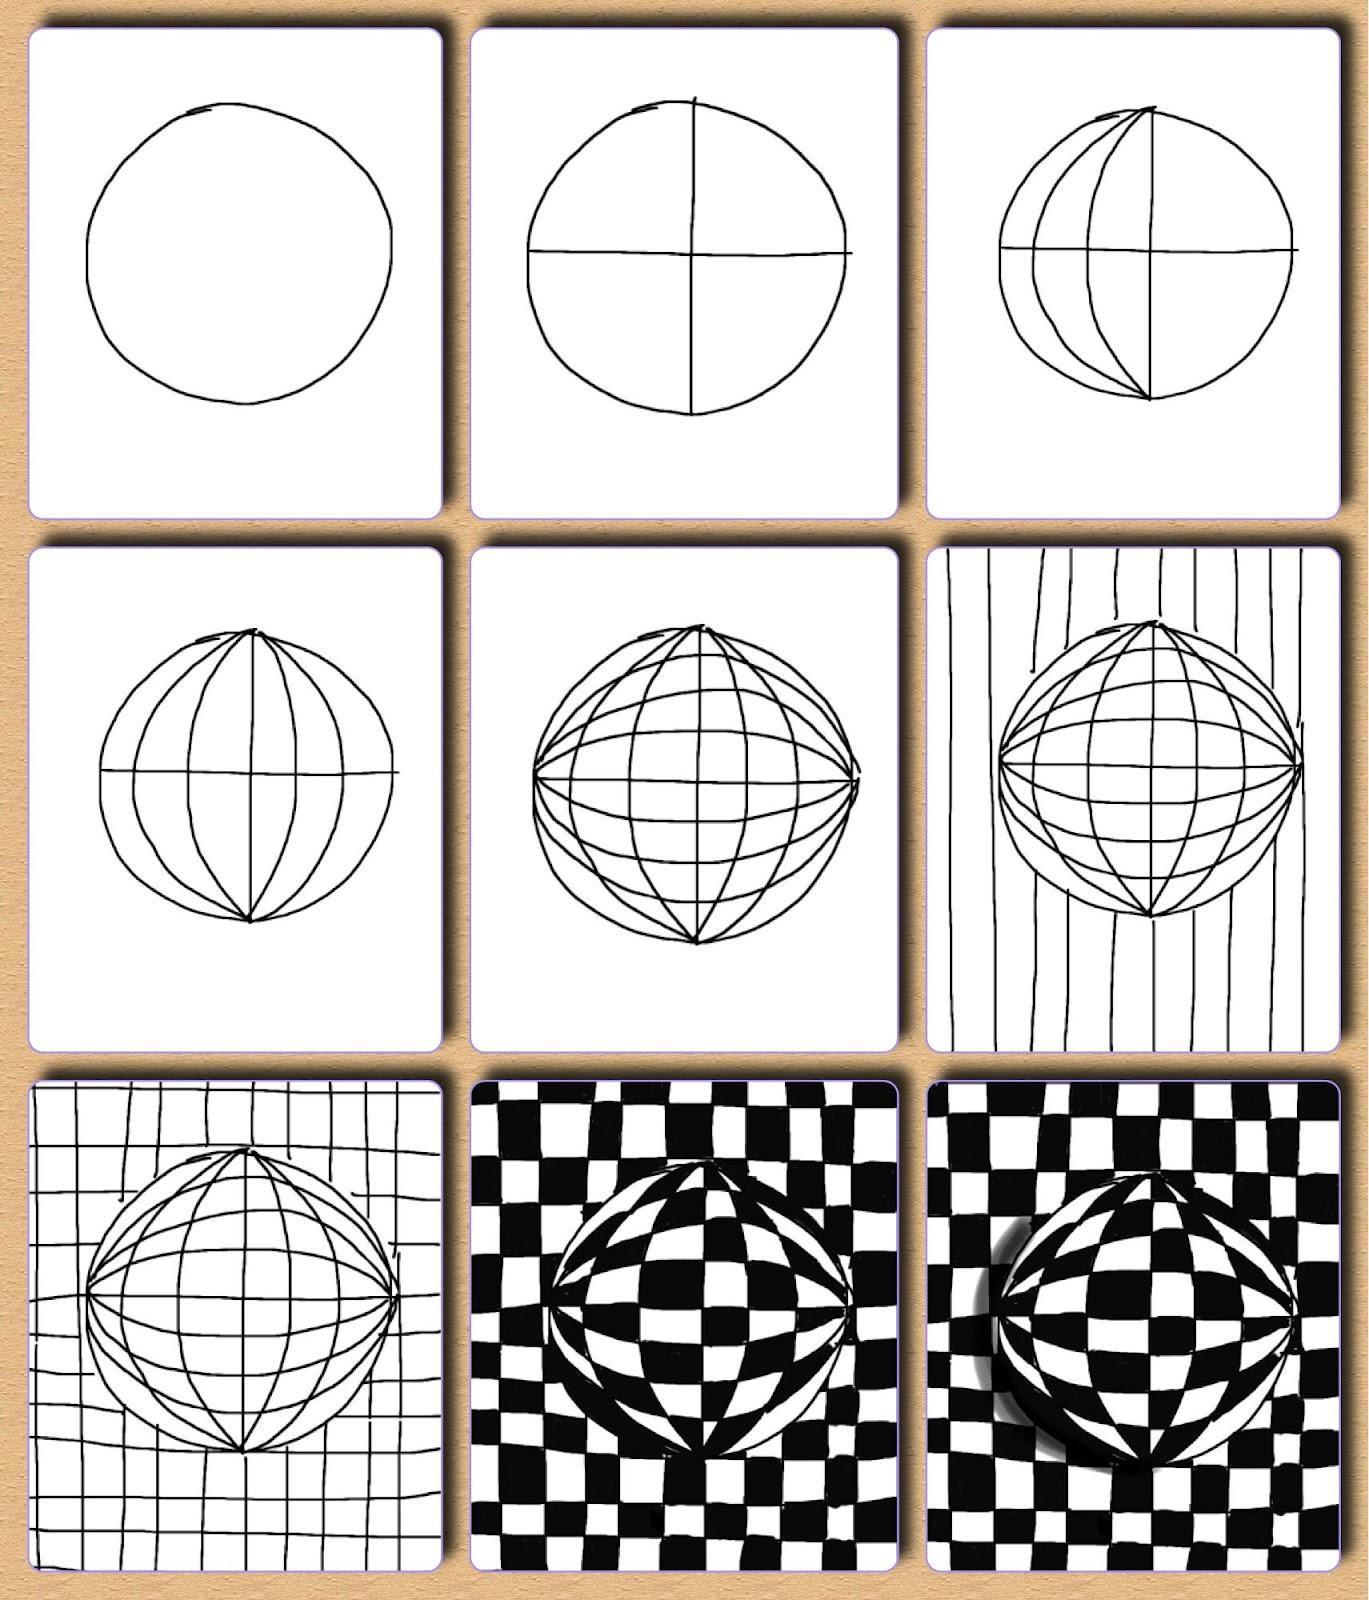 Draw an Optical Illuston